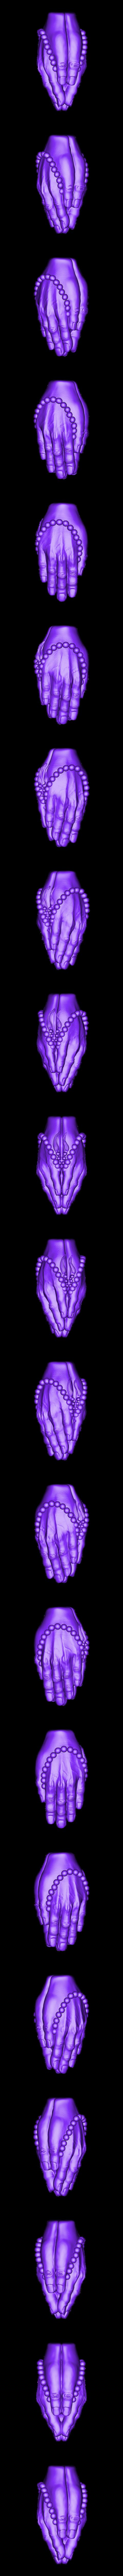 pray.stl Download free STL file praying hands • 3D print model, stlfilesfree